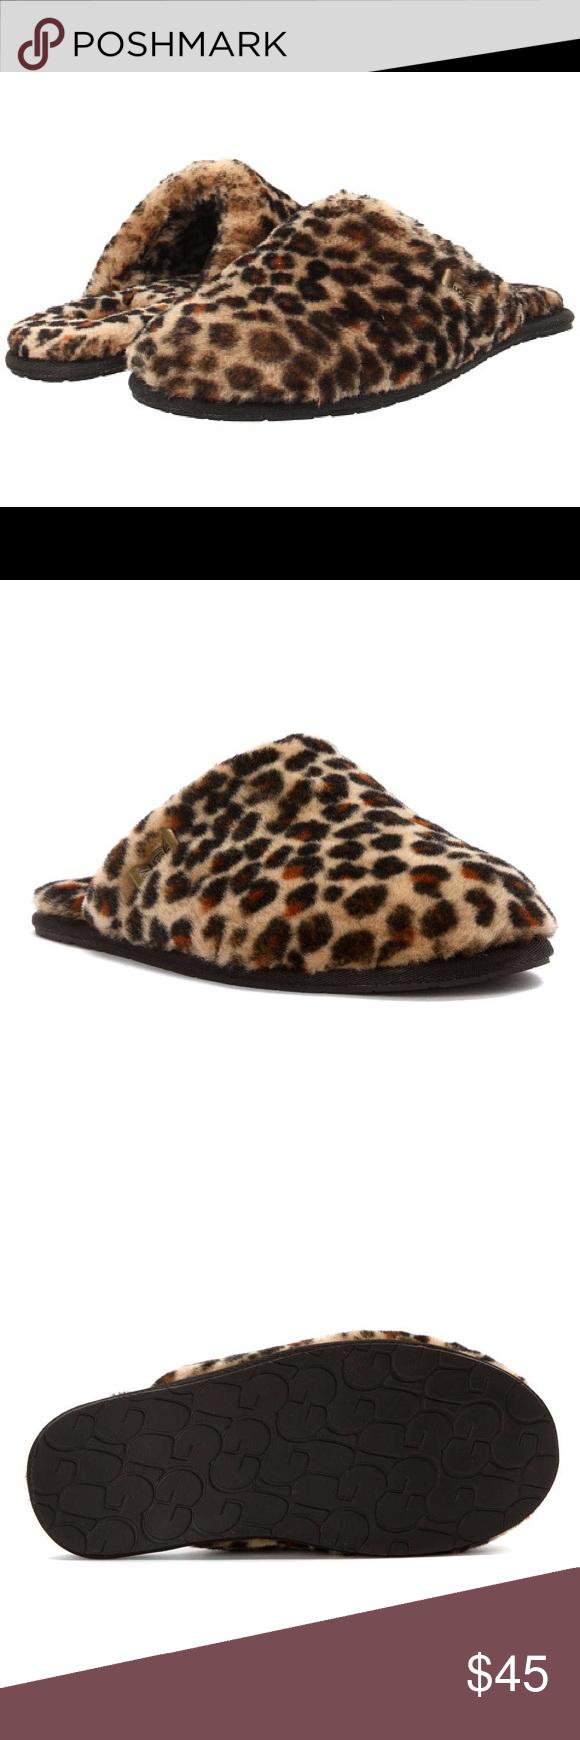 9e87721e9ec Women's UGG Australia Leopard Clog Slide Slippers Never worn. Soft ...